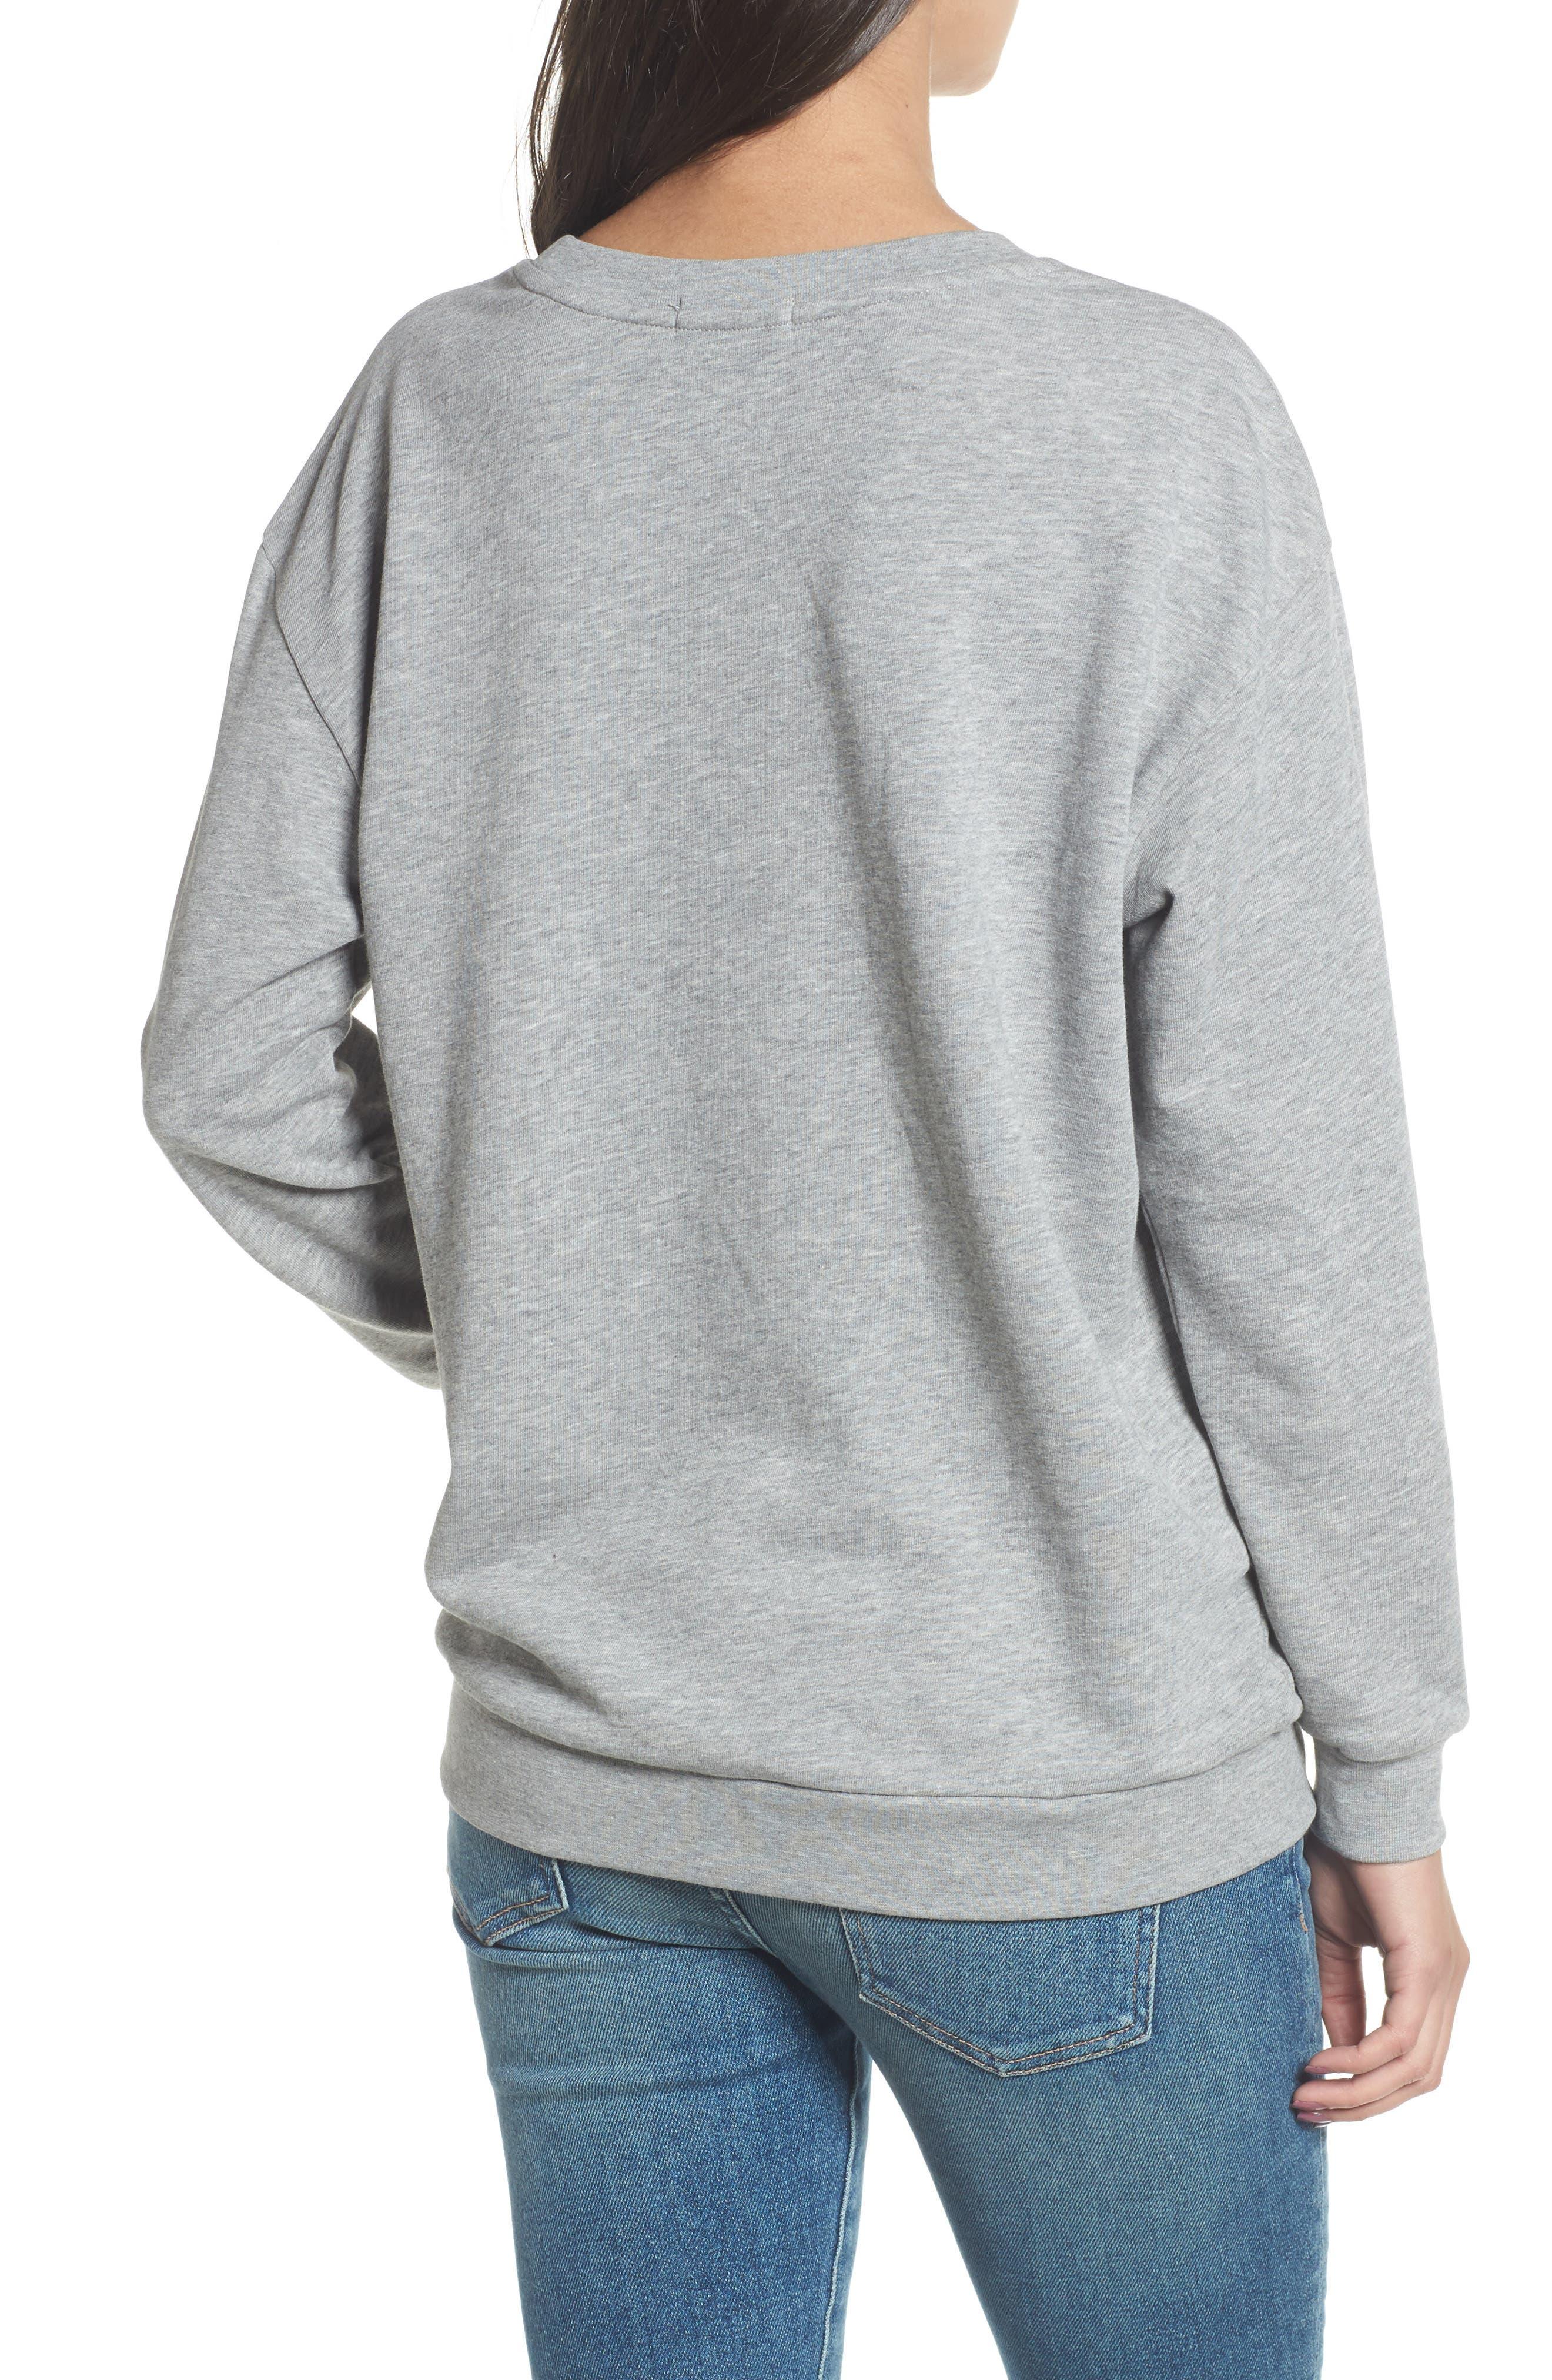 Alexa - Super Stars Sweatshirt,                             Alternate thumbnail 2, color,                             020